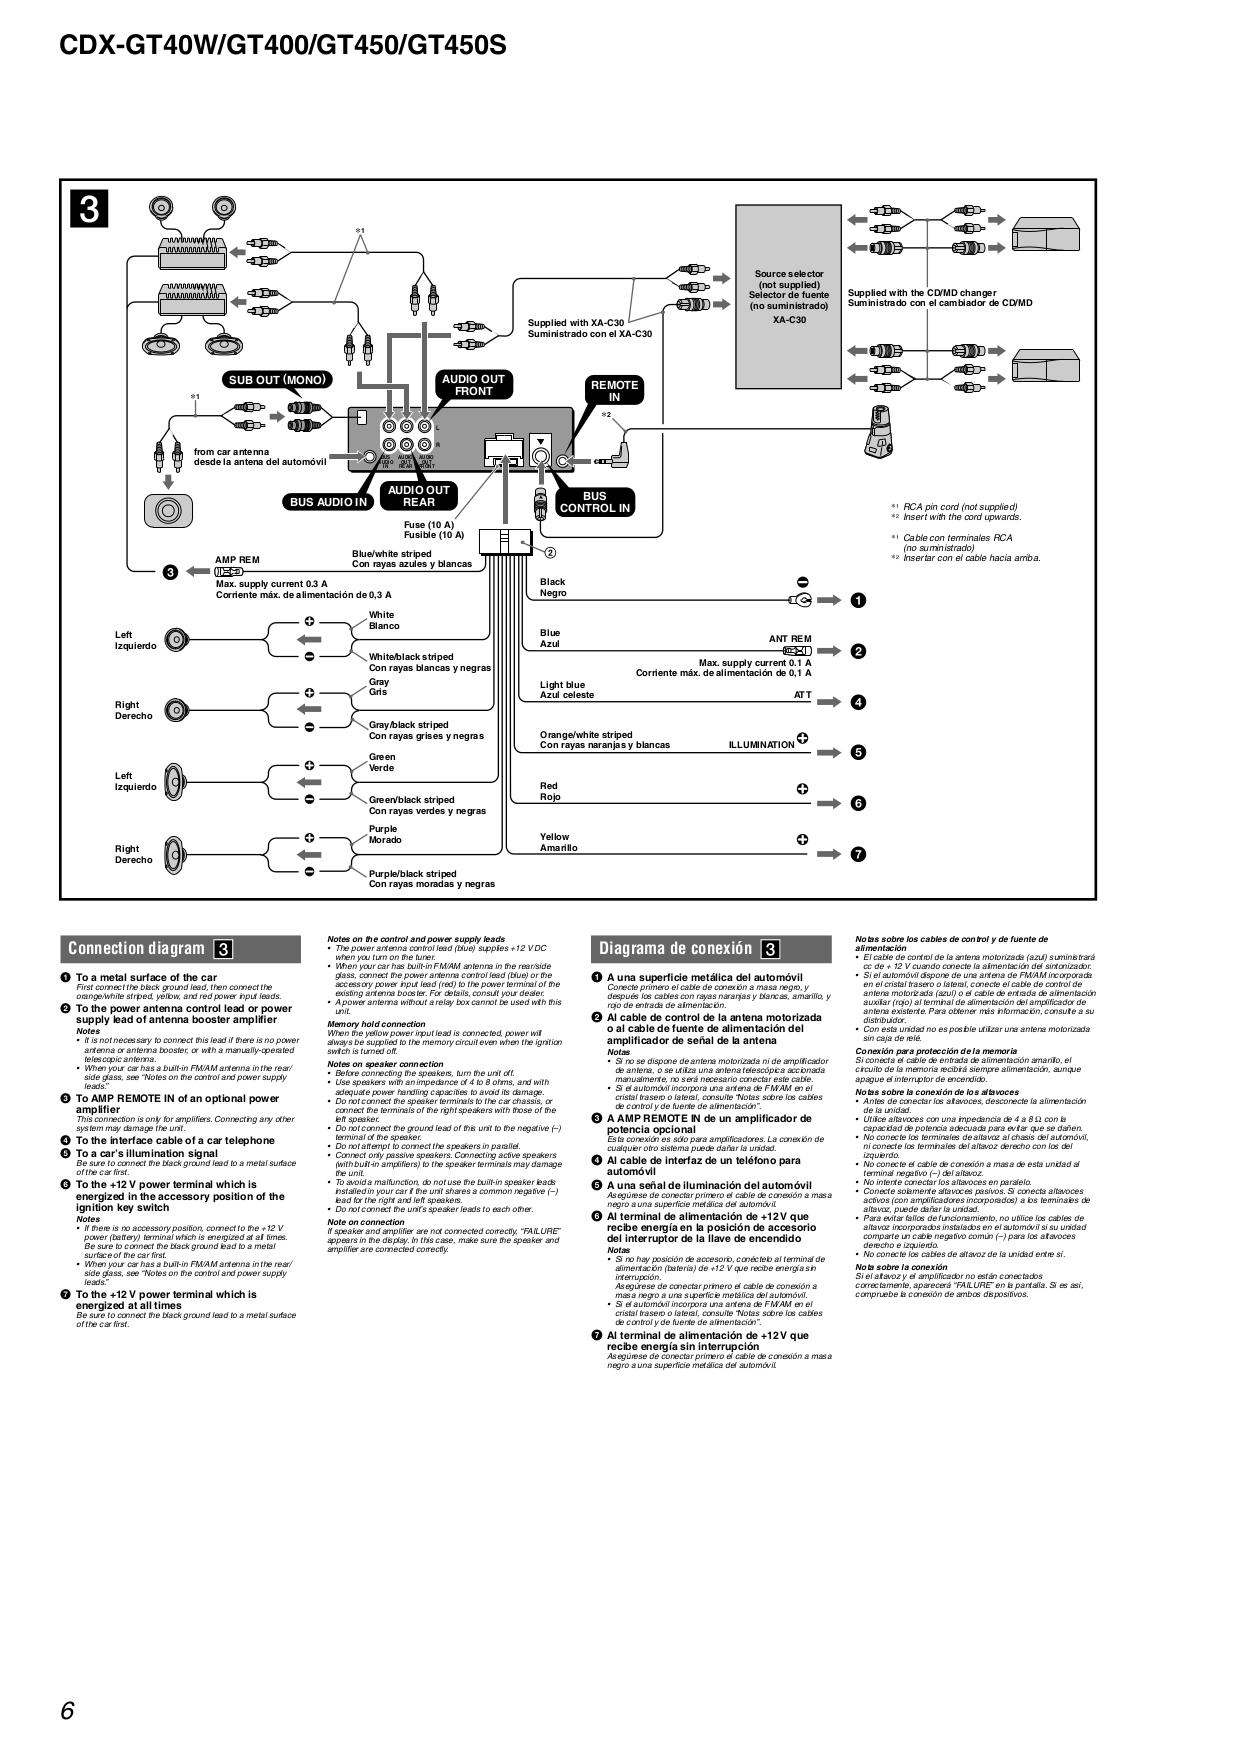 [DIAGRAM_0HG]  ZO_9940] Sony Xplod Drive S Cdx Gt40W Wiring Diagram Wiring Diagram | Wiring Diagram Sony Drive S |  | Ymoon Winn Xortanet Salv Mohammedshrine Librar Wiring 101